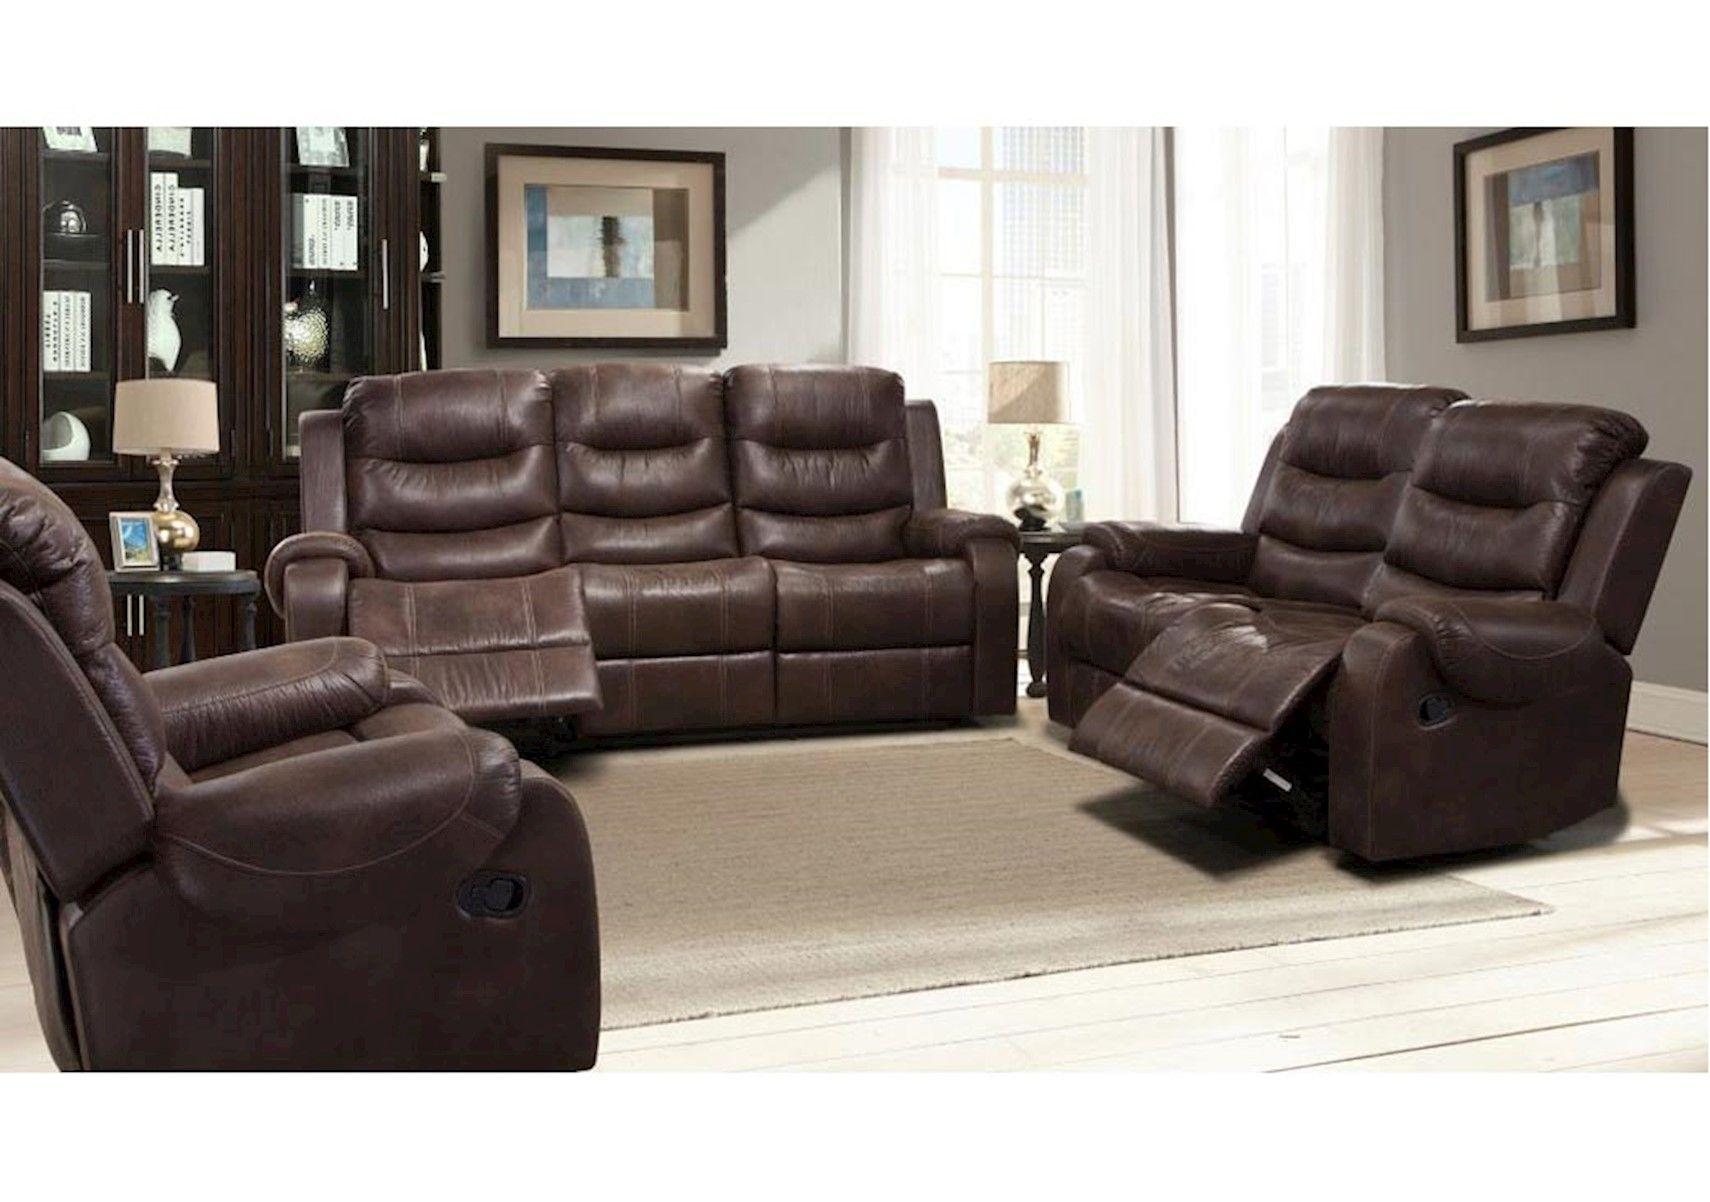 Lacks Baron 2 Pc Living Room Set Living Room Sets Home Living